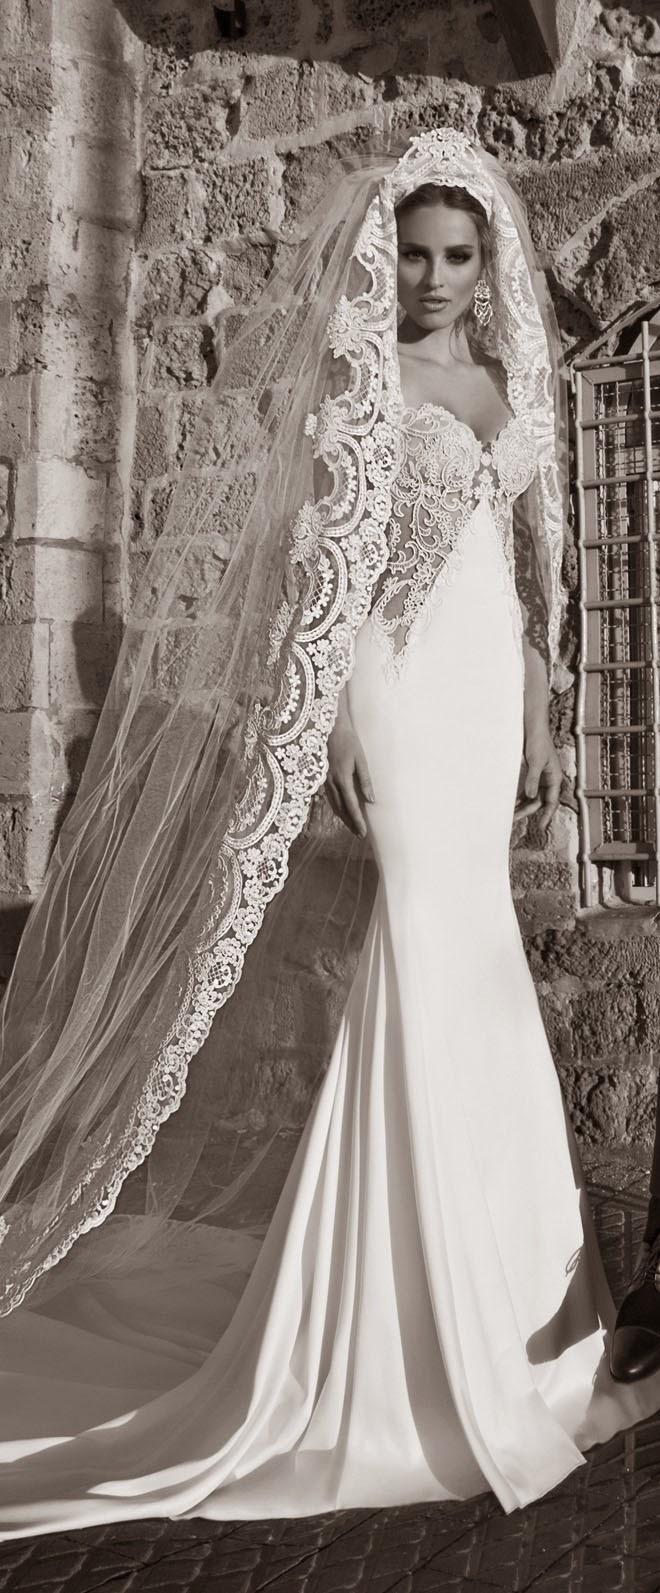 Galia Lahav Spring 2015 : La Dolce Vita Bridal Collection ...